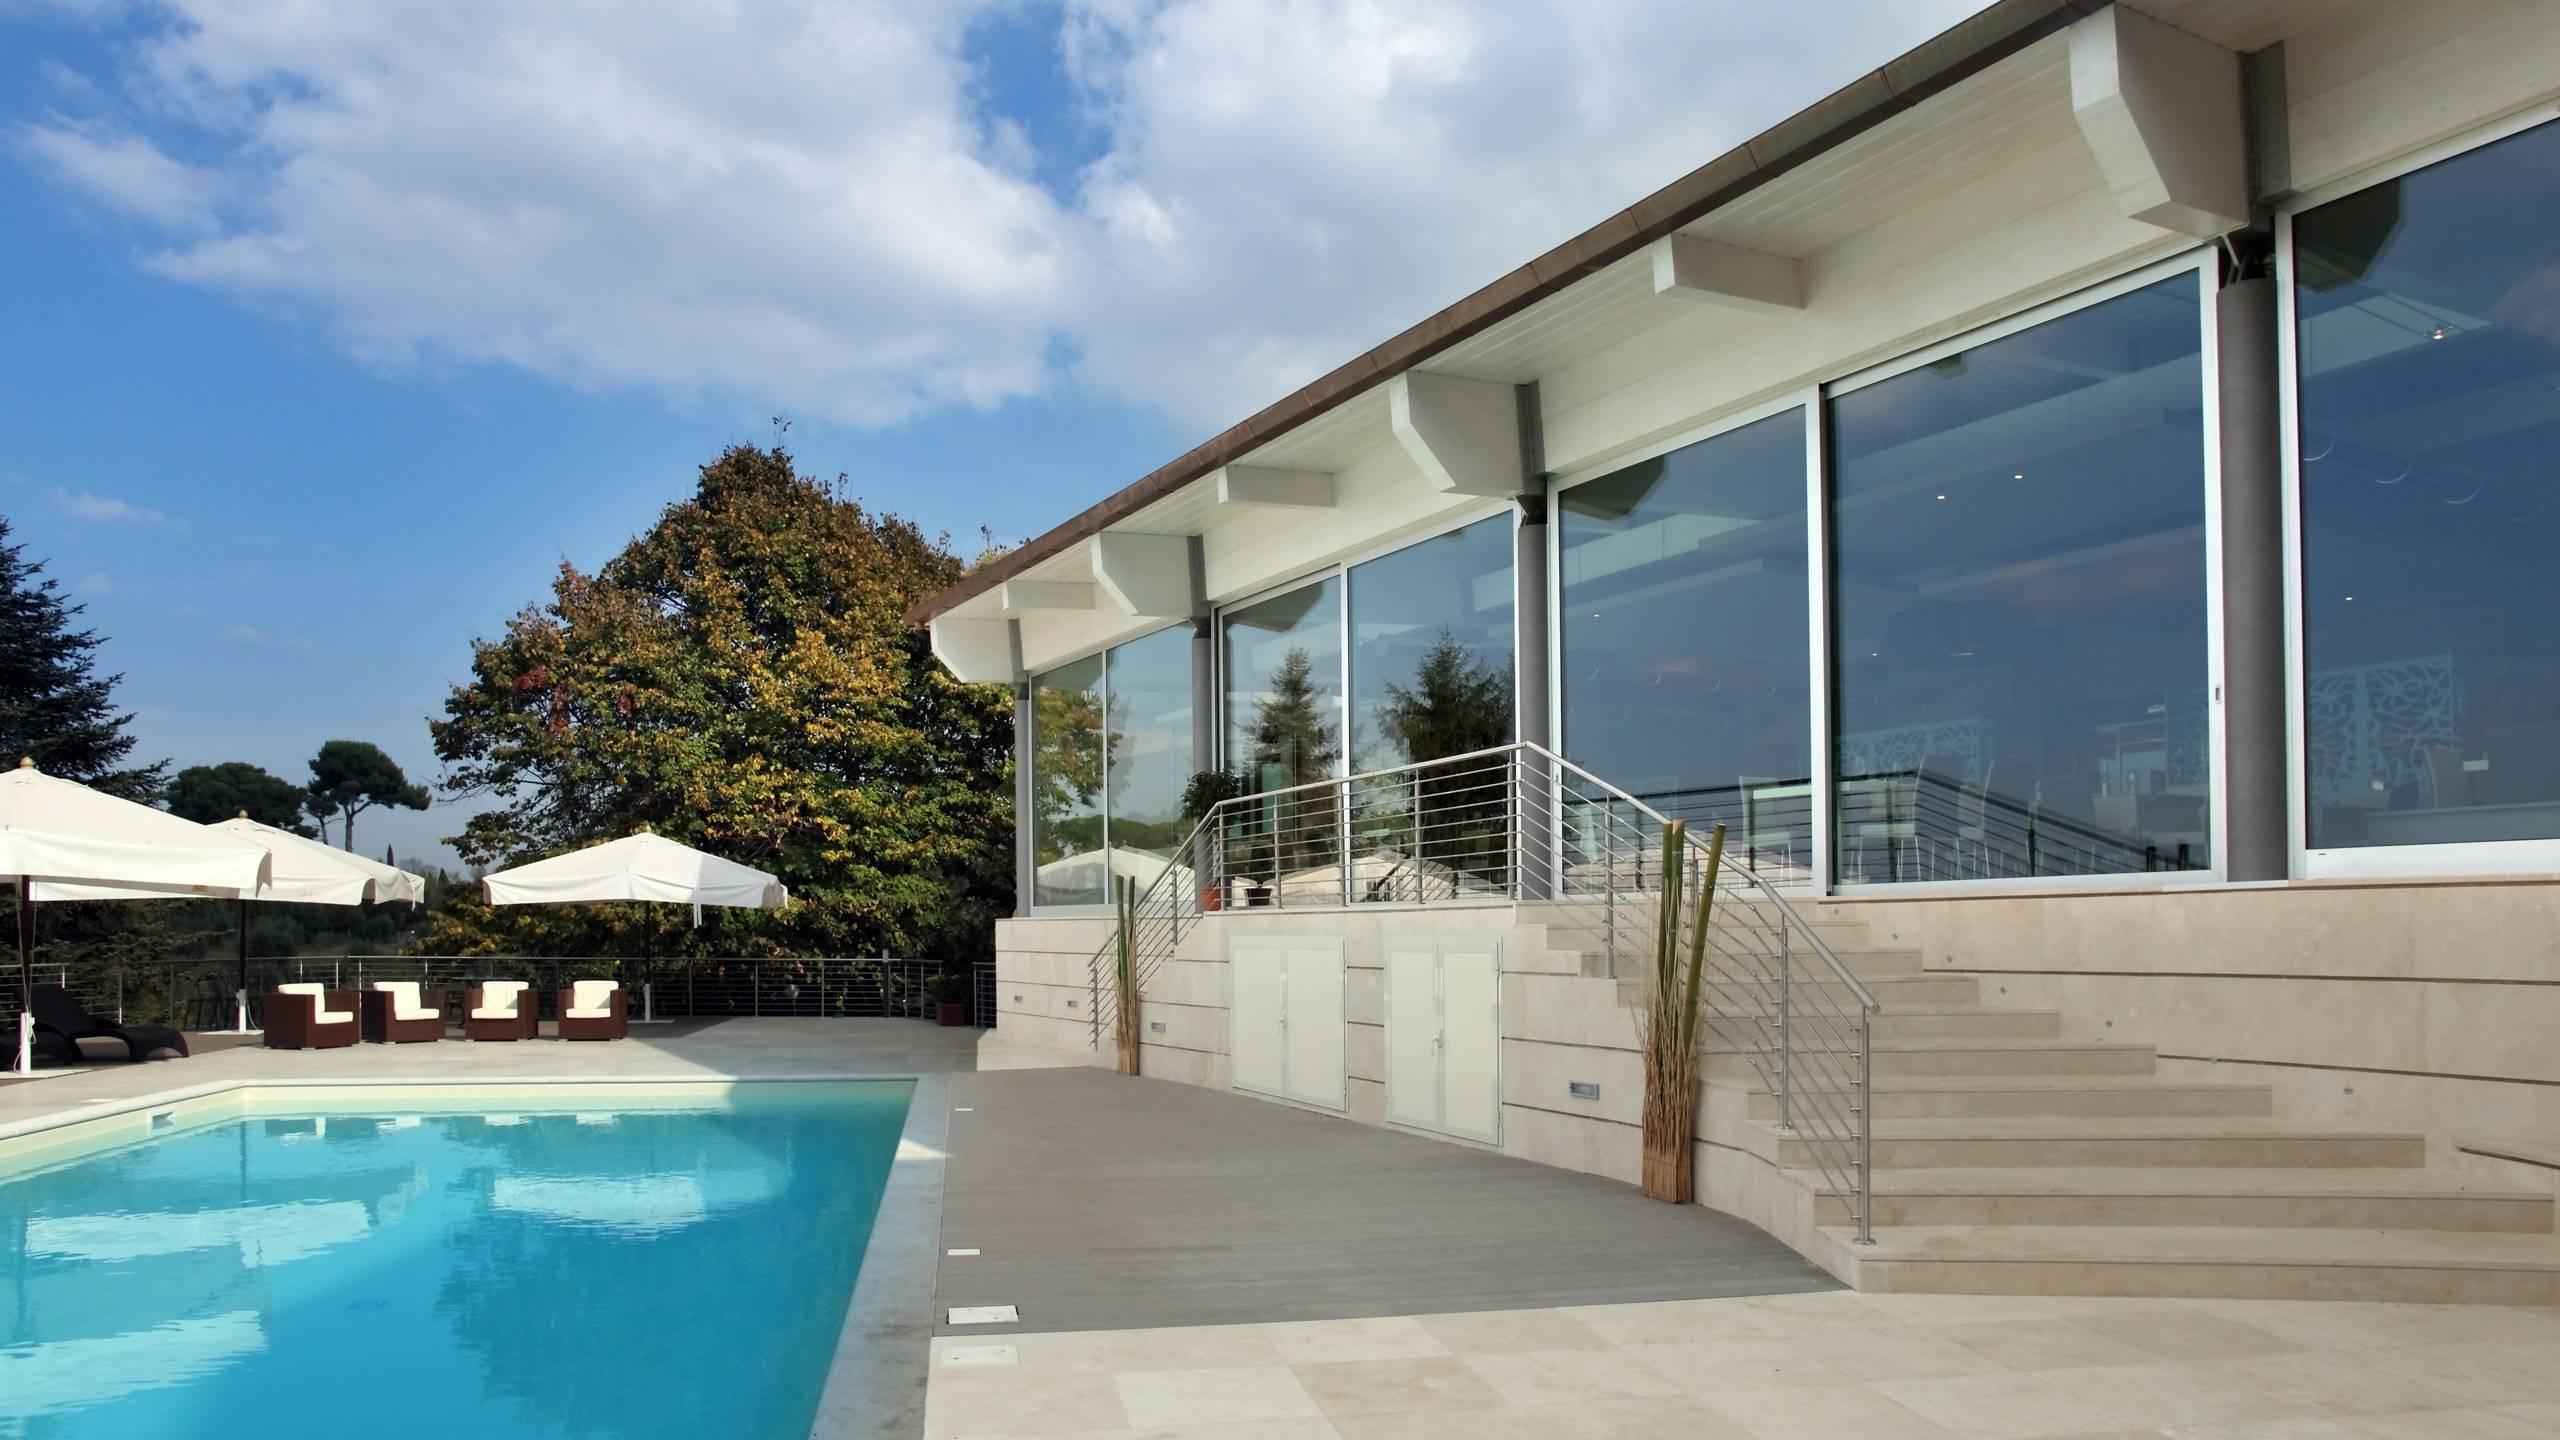 villamercede-piscina-26